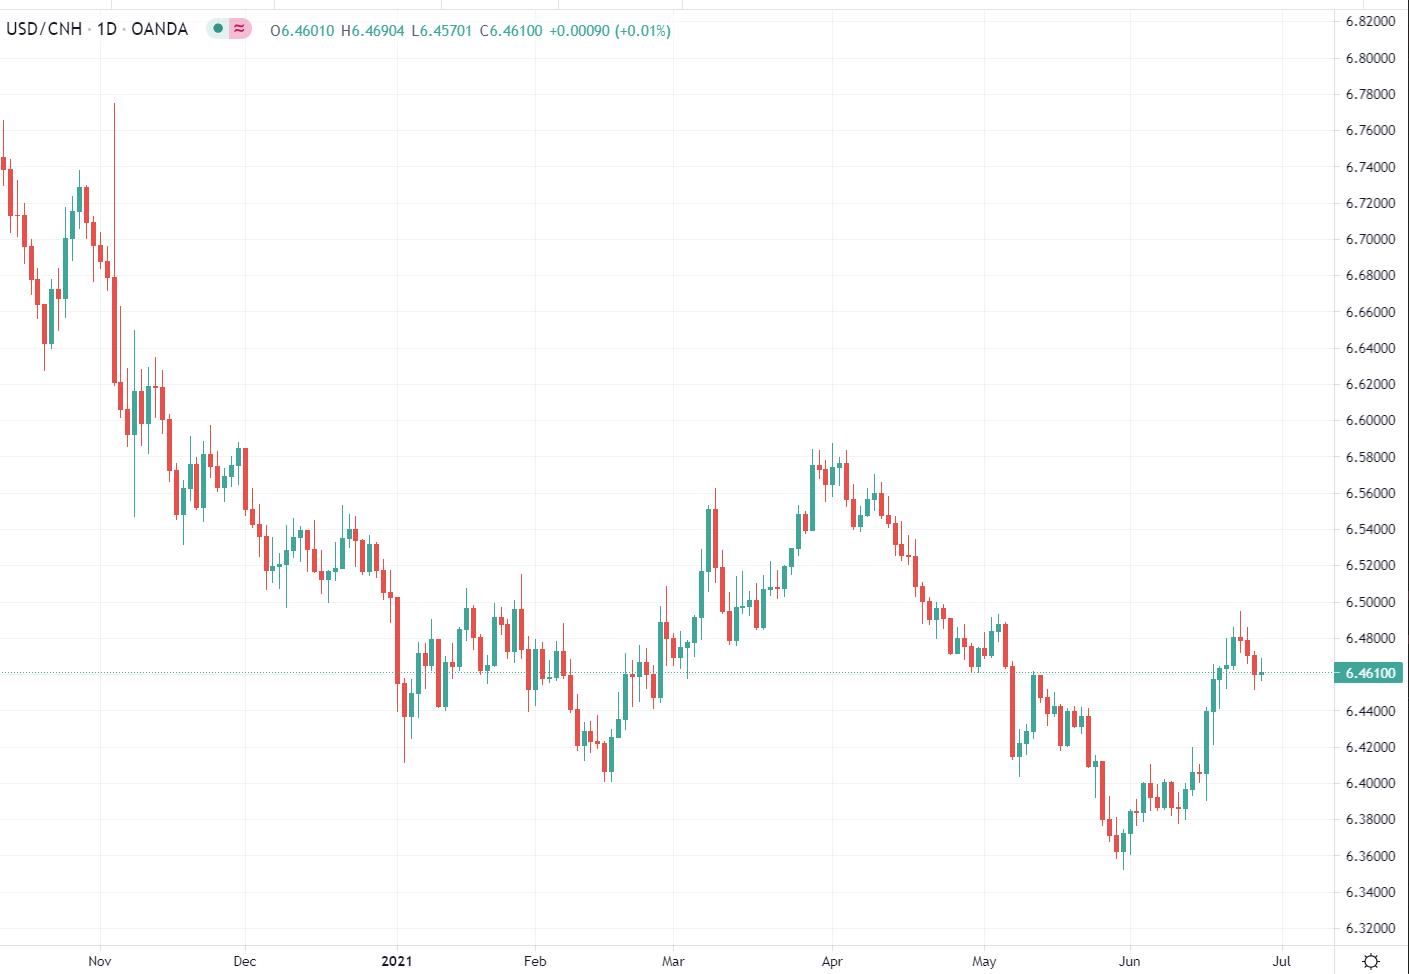 usd/cnh chart 29 June 2021